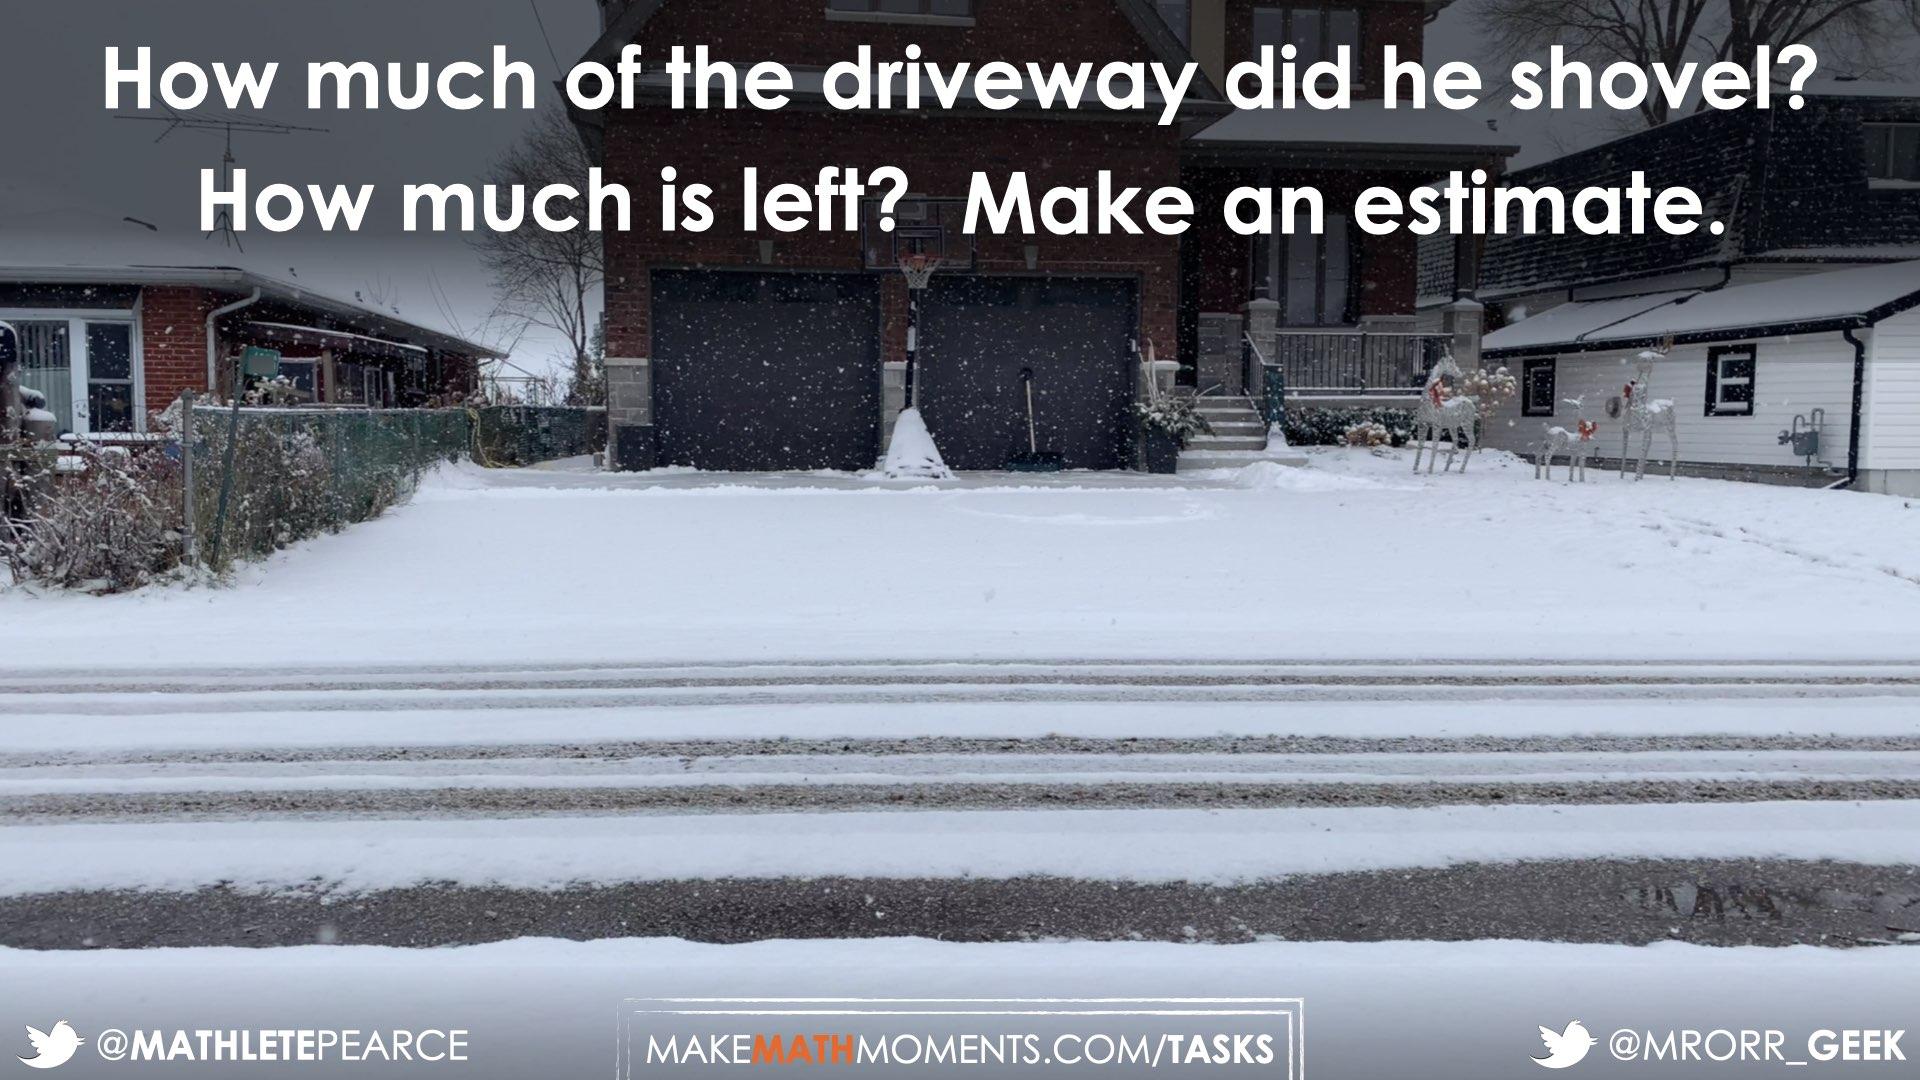 Shovelling-The-Driveway-Day-1-03-Spark-Prompt-Estimate-Image.jpeg